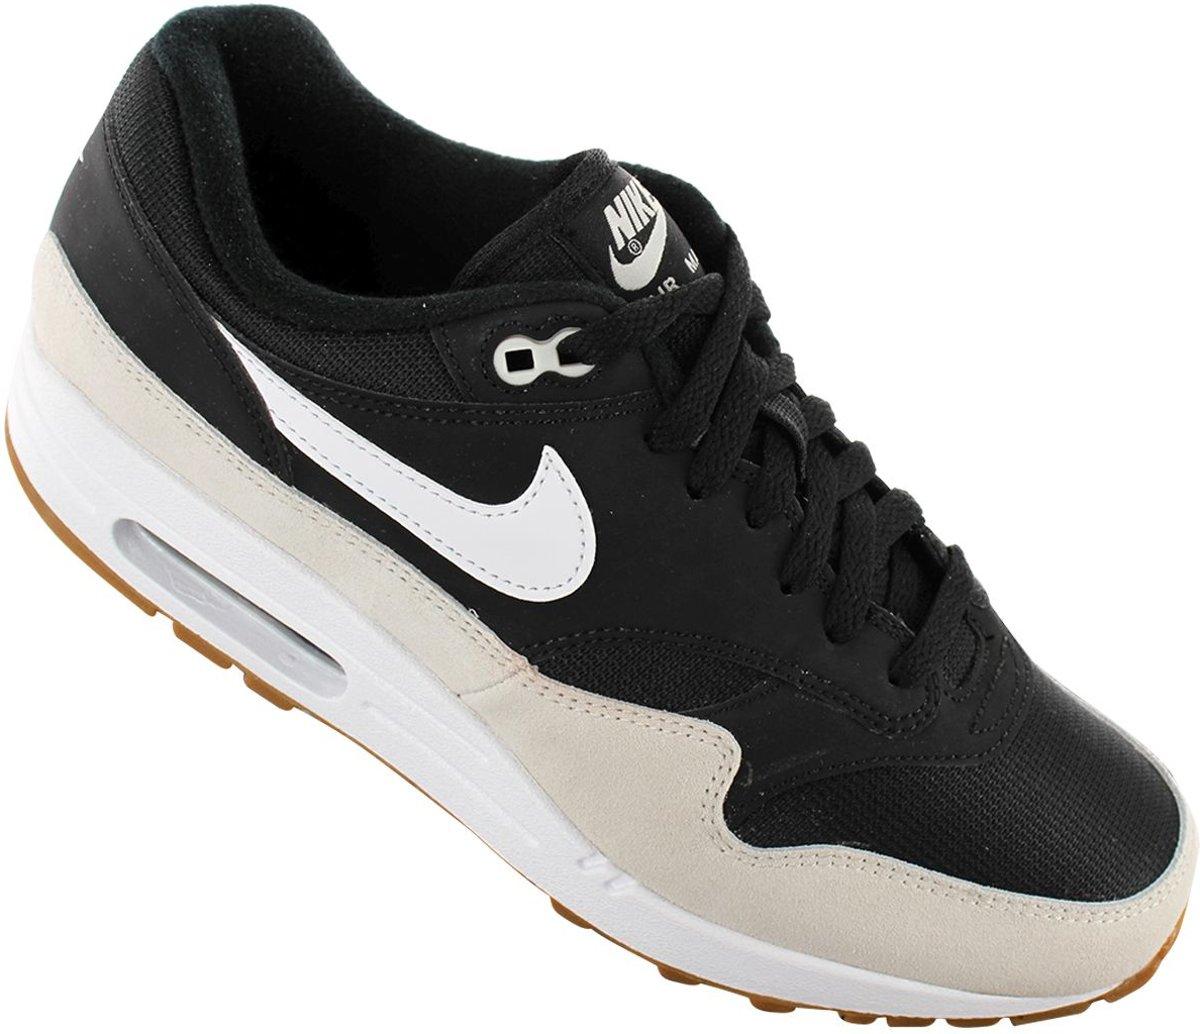 Nike Air Max 1 Zwart Wit Heren Sneakers AH8145 009 Maat 40.5